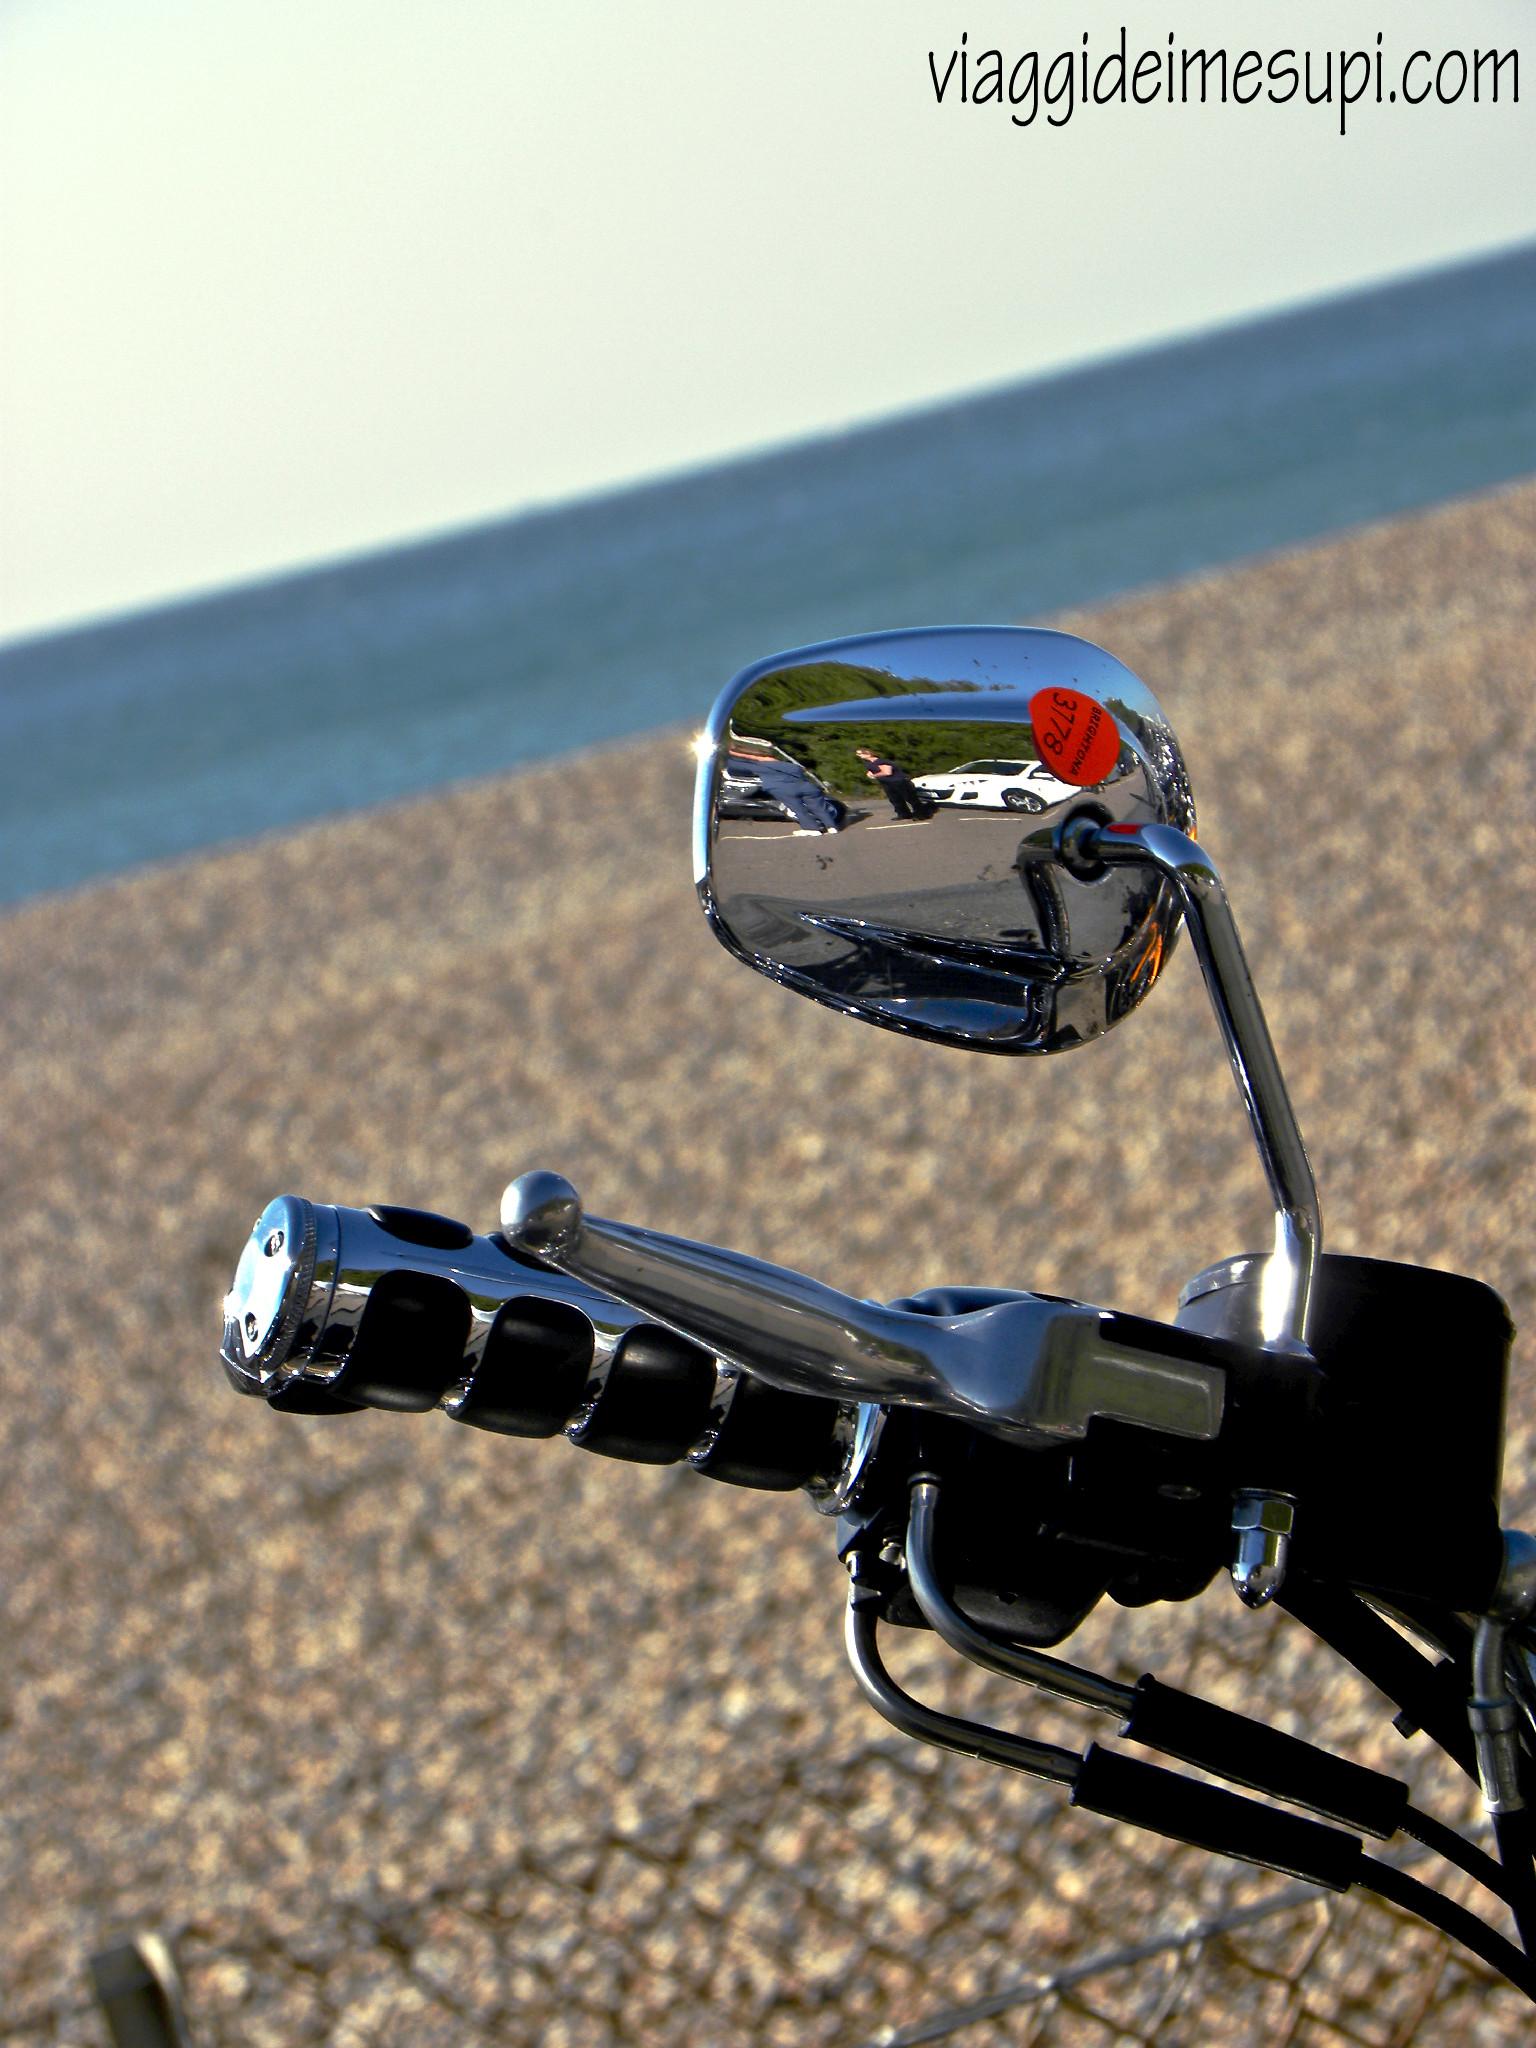 Brightona Harley